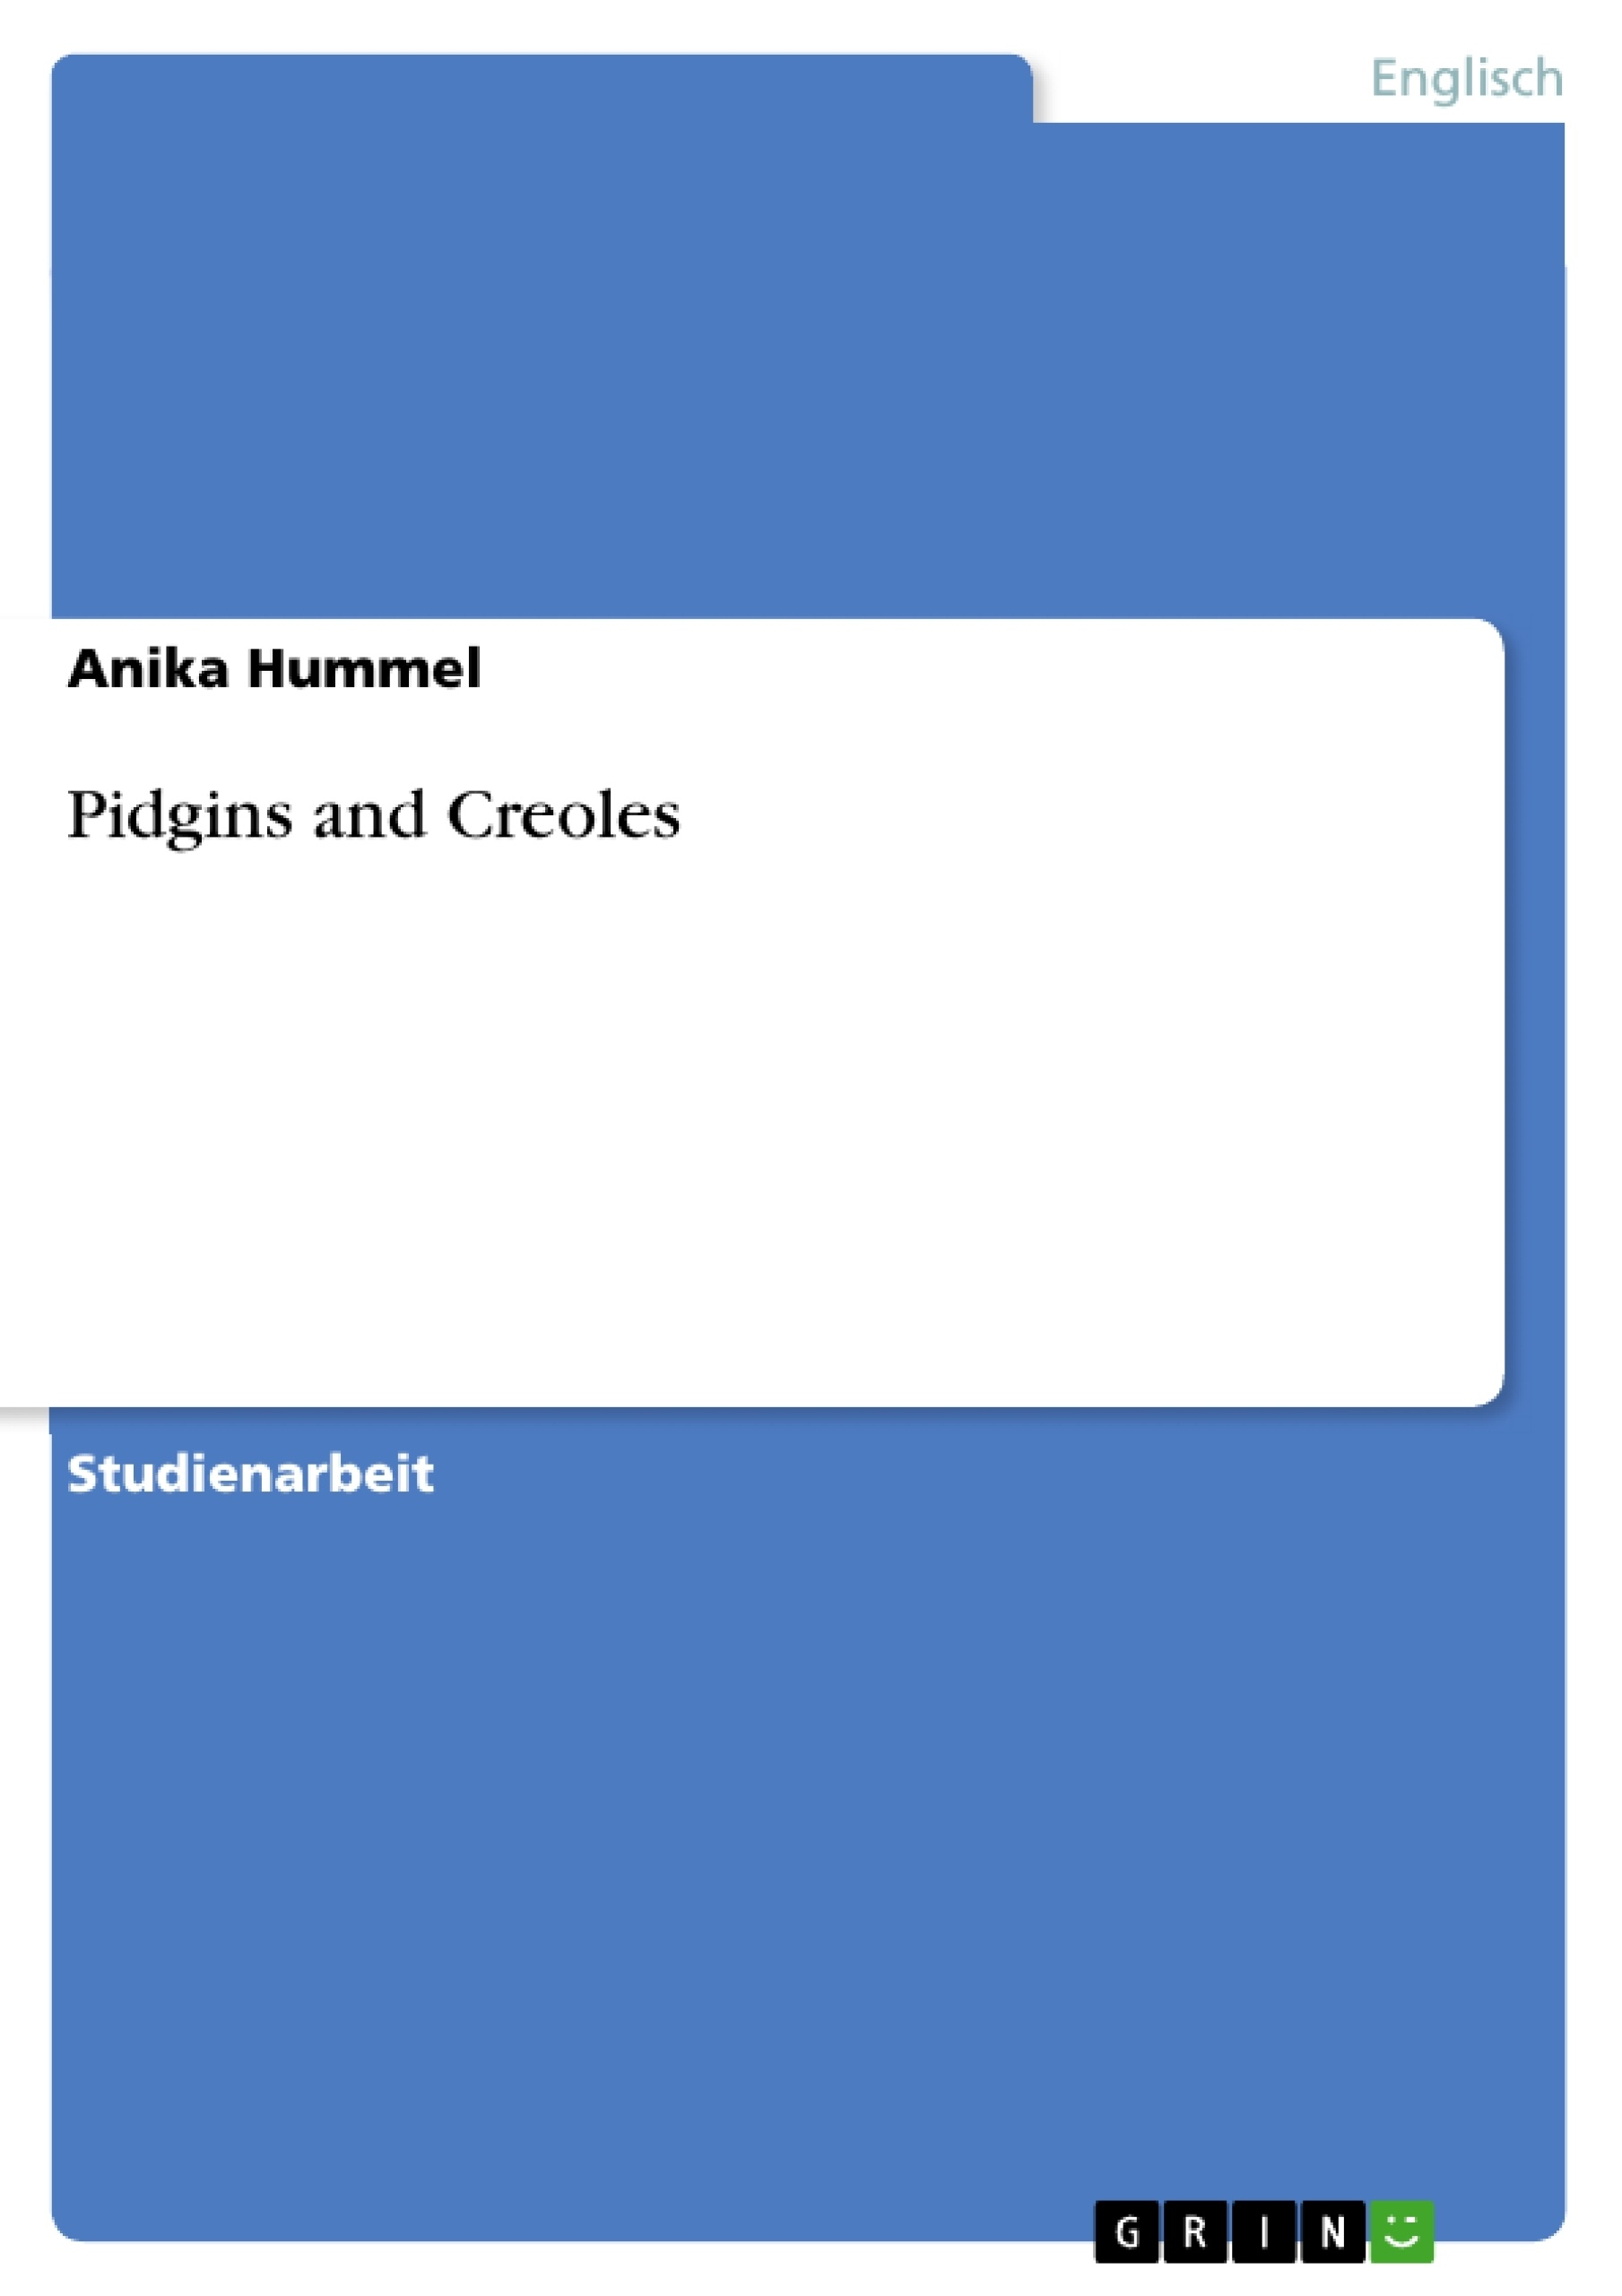 Pidgins and Creoles | Masterarbeit, Hausarbeit, Bachelorarbeit ...